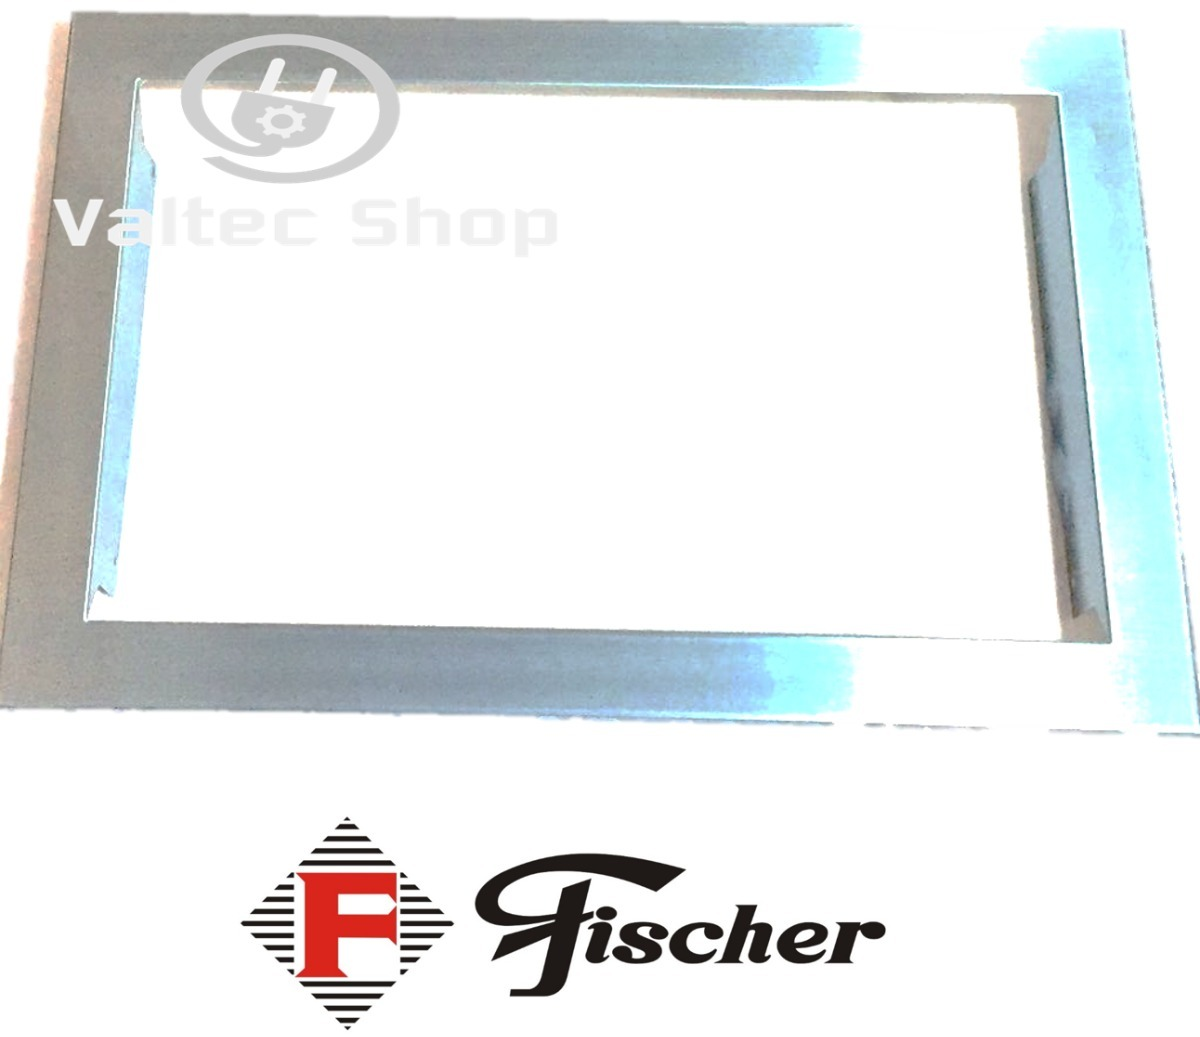 Moldura inox microondas fischer 23l 24l 6946 original r 179 49 em mercado livre - Microondas de encastrar ...